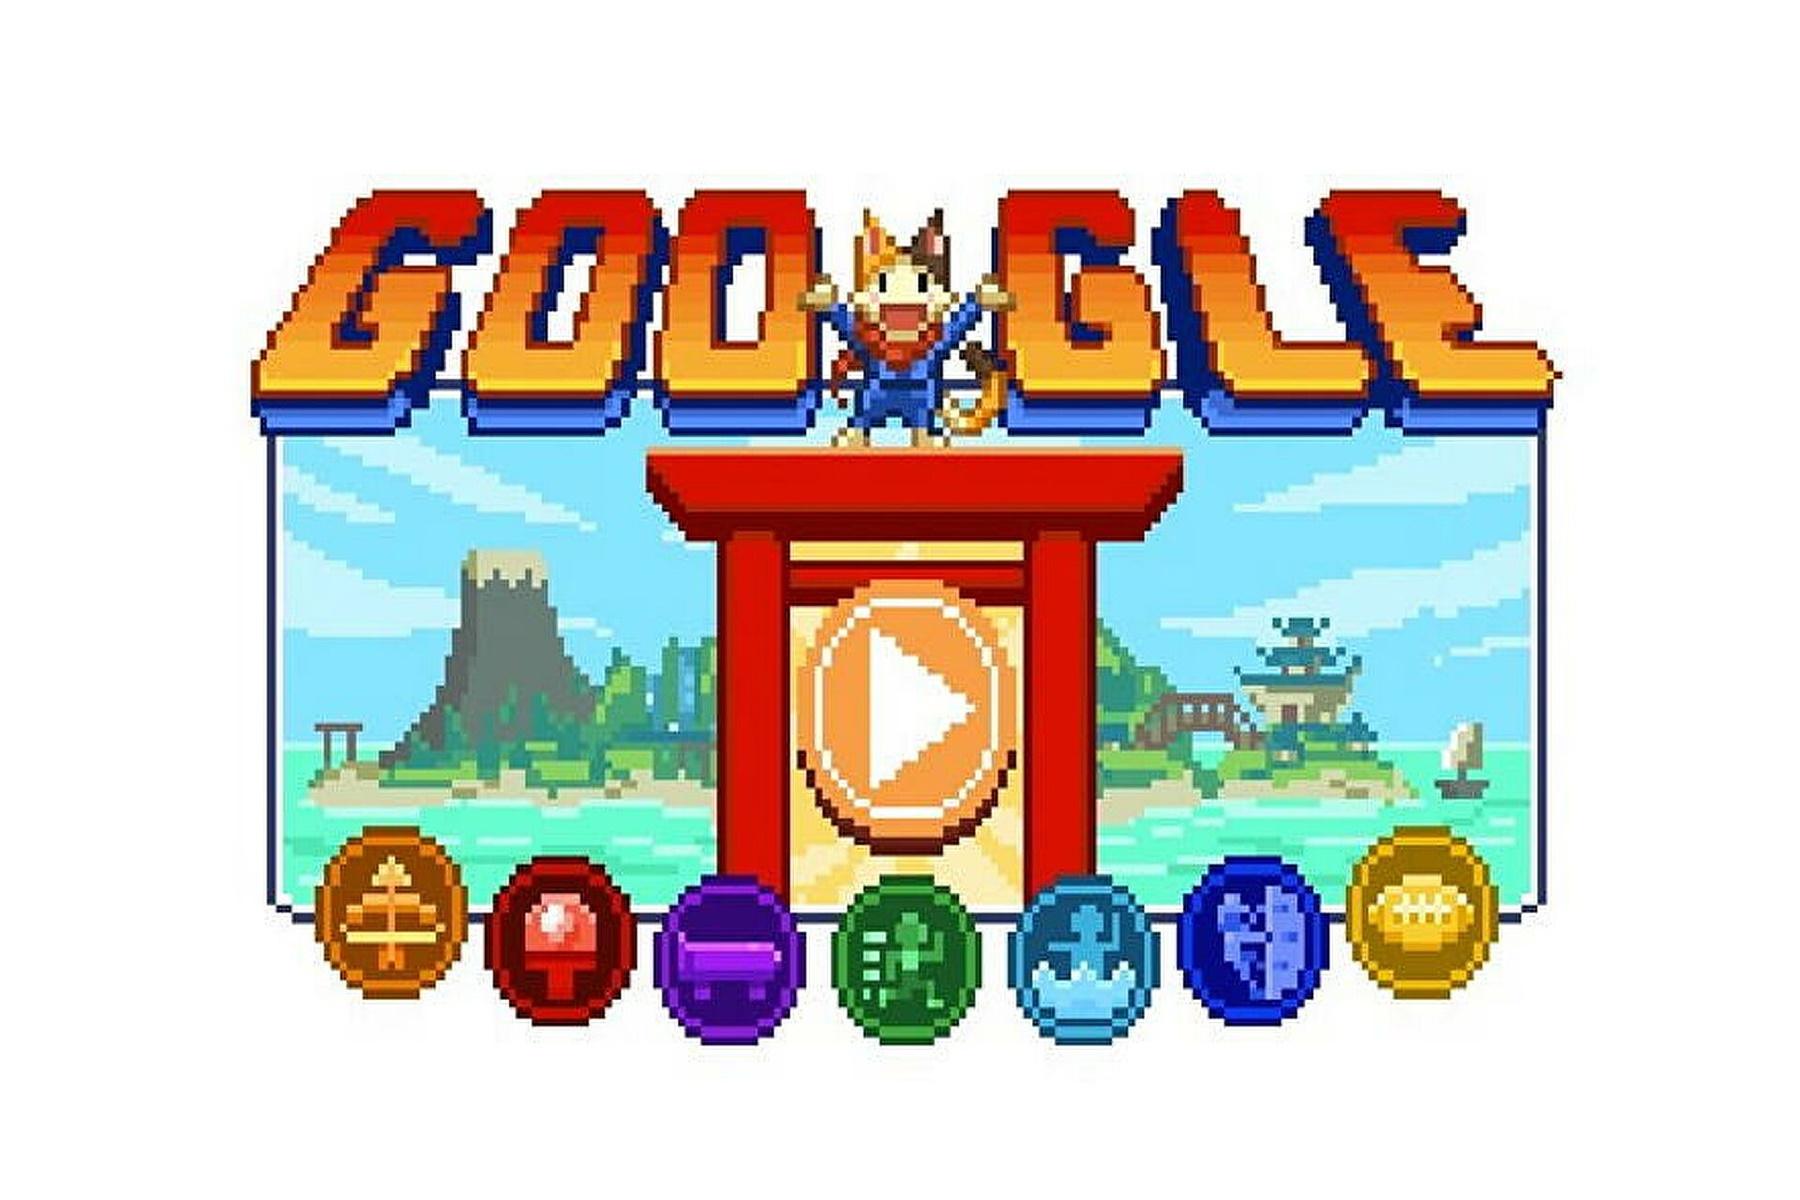 Google Doodle : Γιορτάζει τους ολυμπιακούς αγώνες με διαδραστικό παιχνίδι